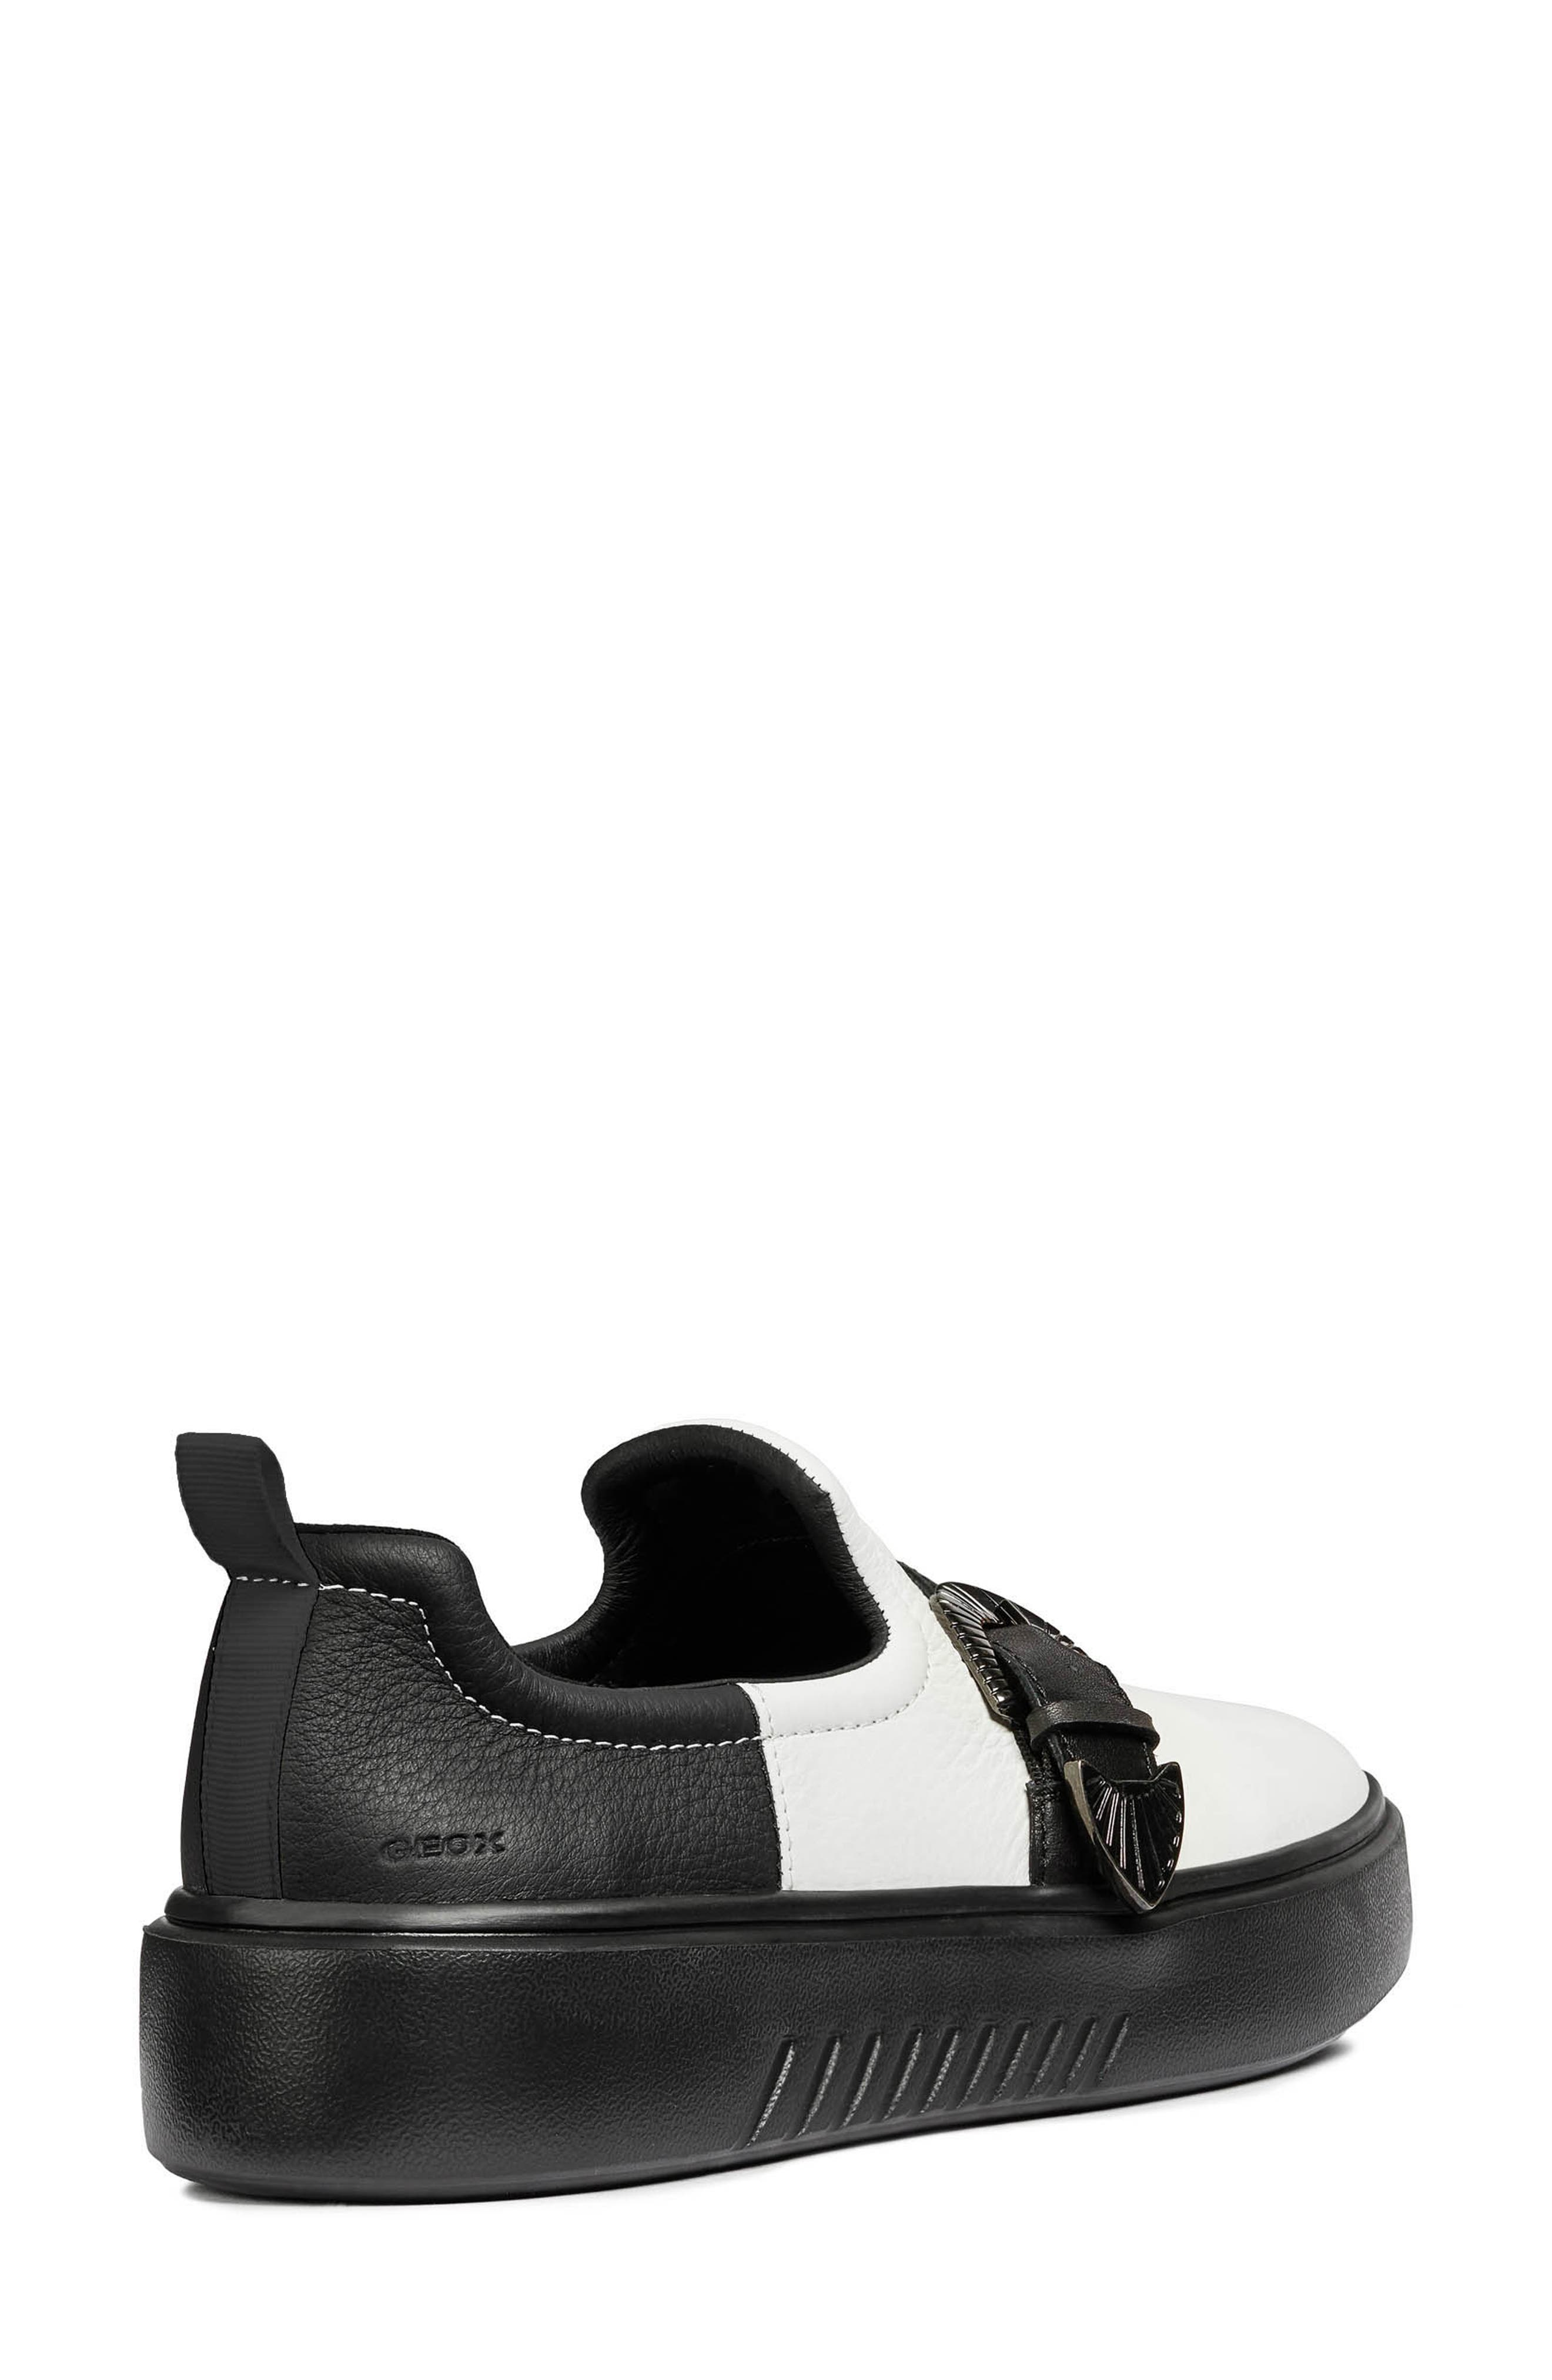 Nhenbus Platform Sneaker,                             Alternate thumbnail 2, color,                             WHITE/ BLACK LEATHER